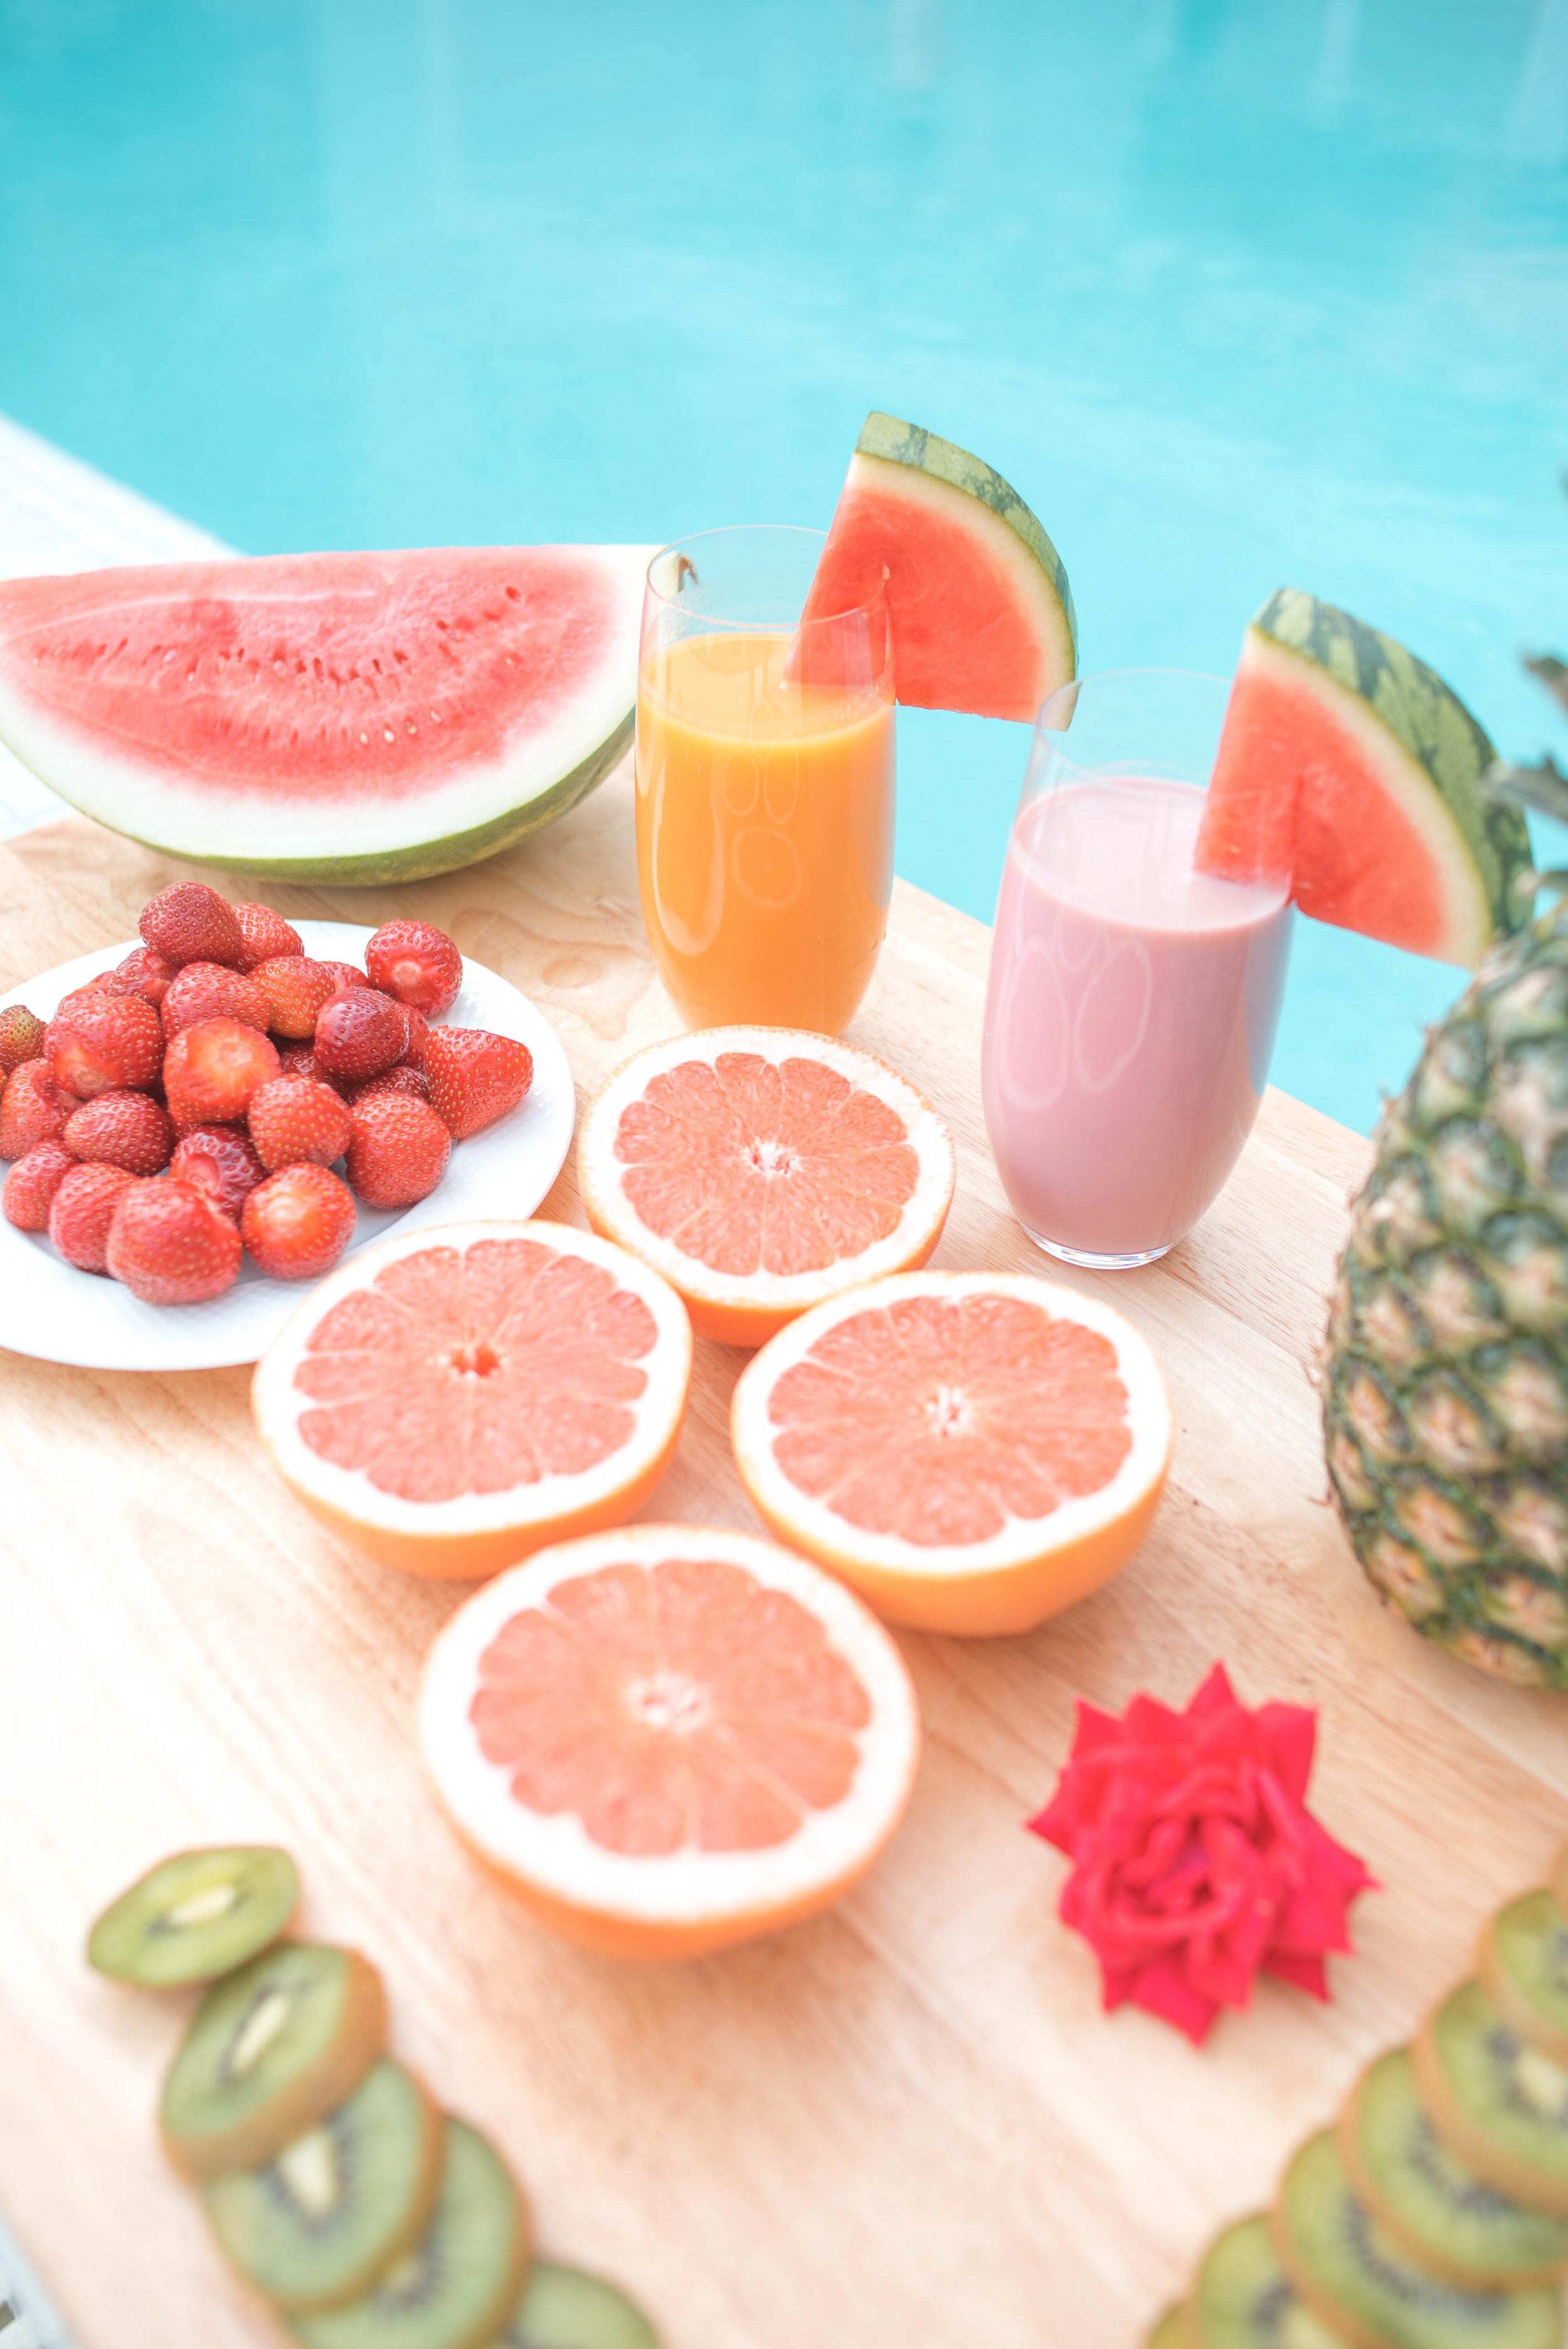 intermittent fasting foods